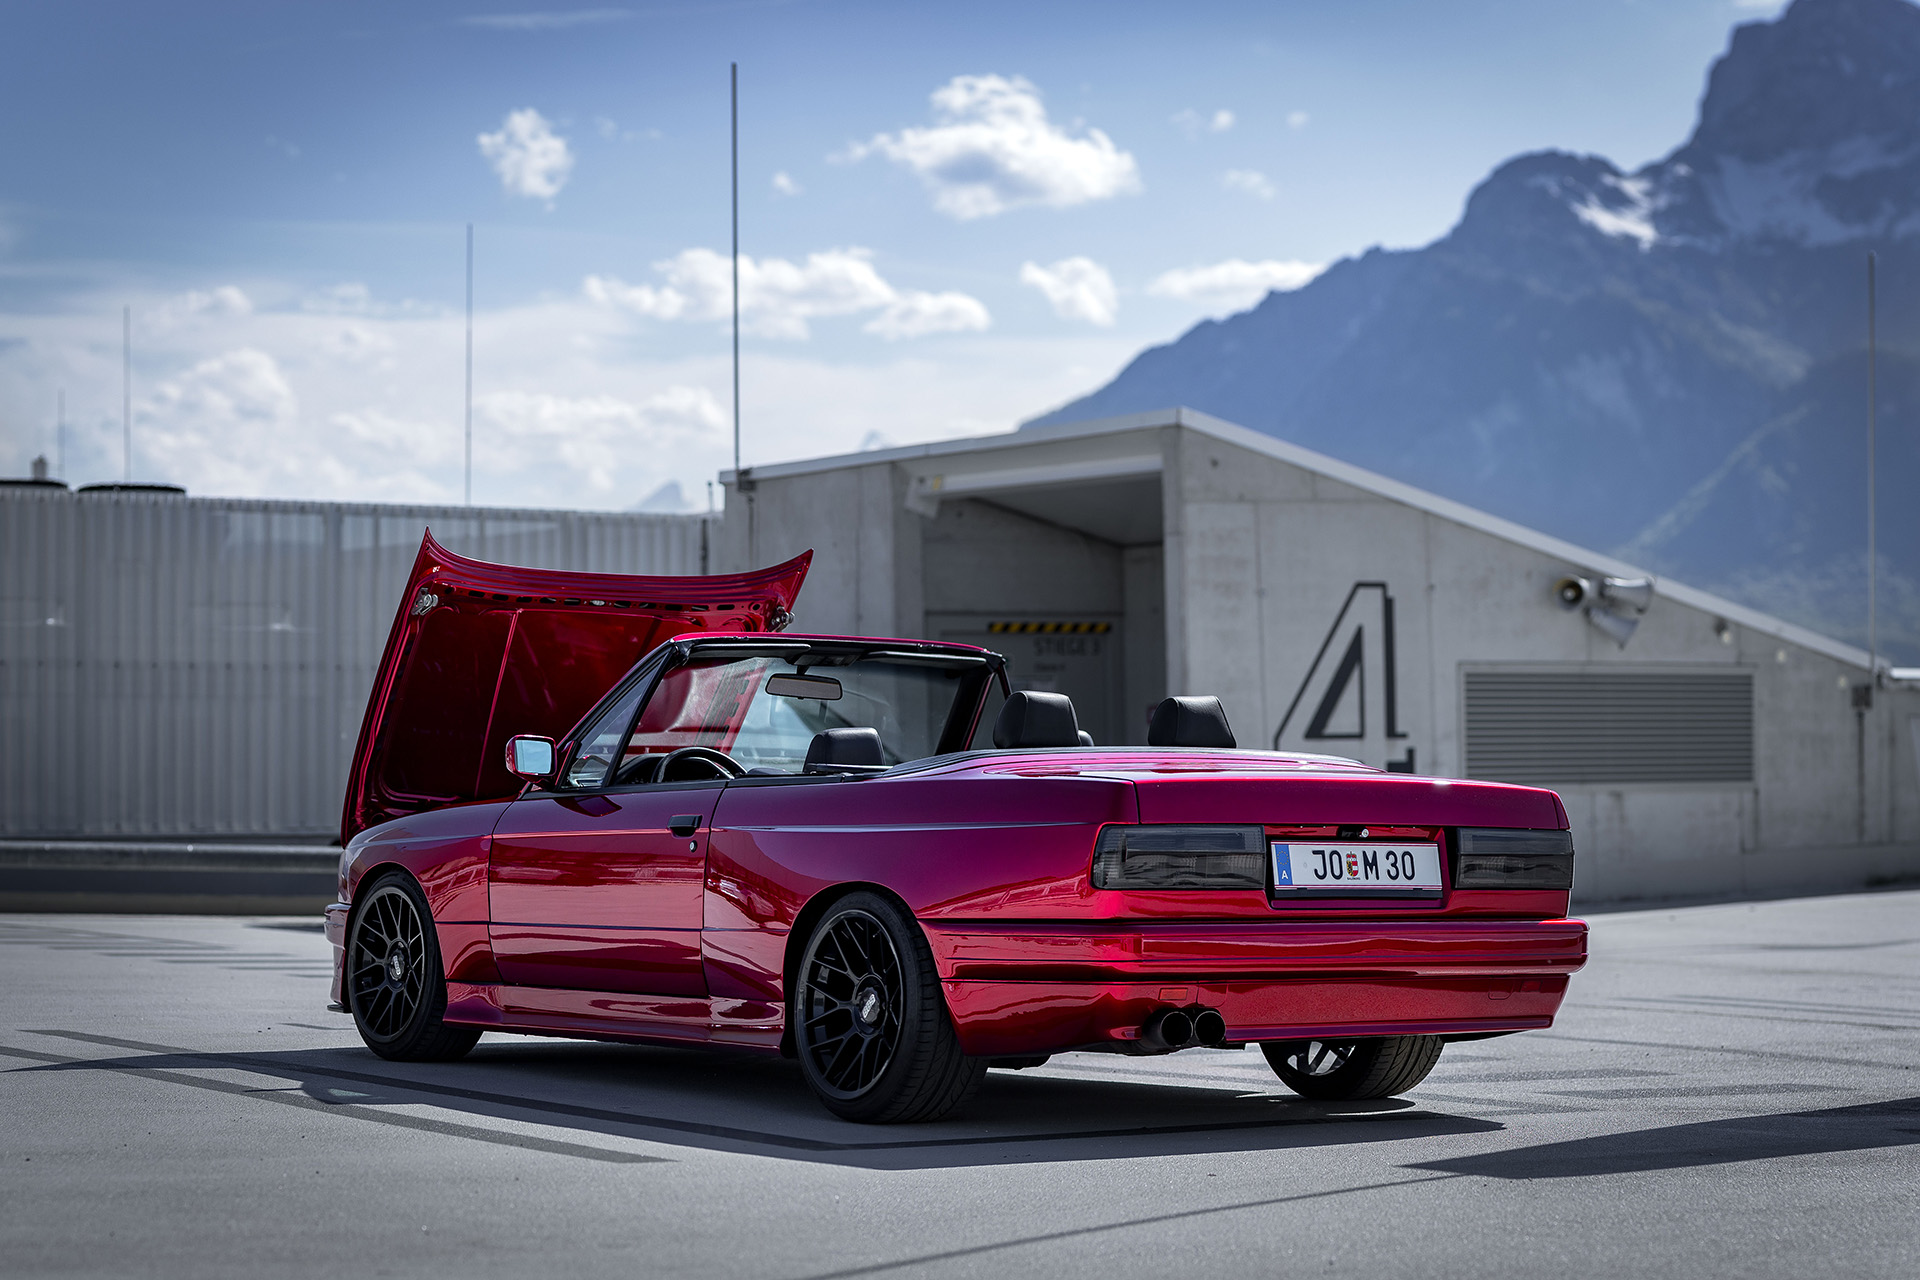 Portfolio_Automotive_BMWM3